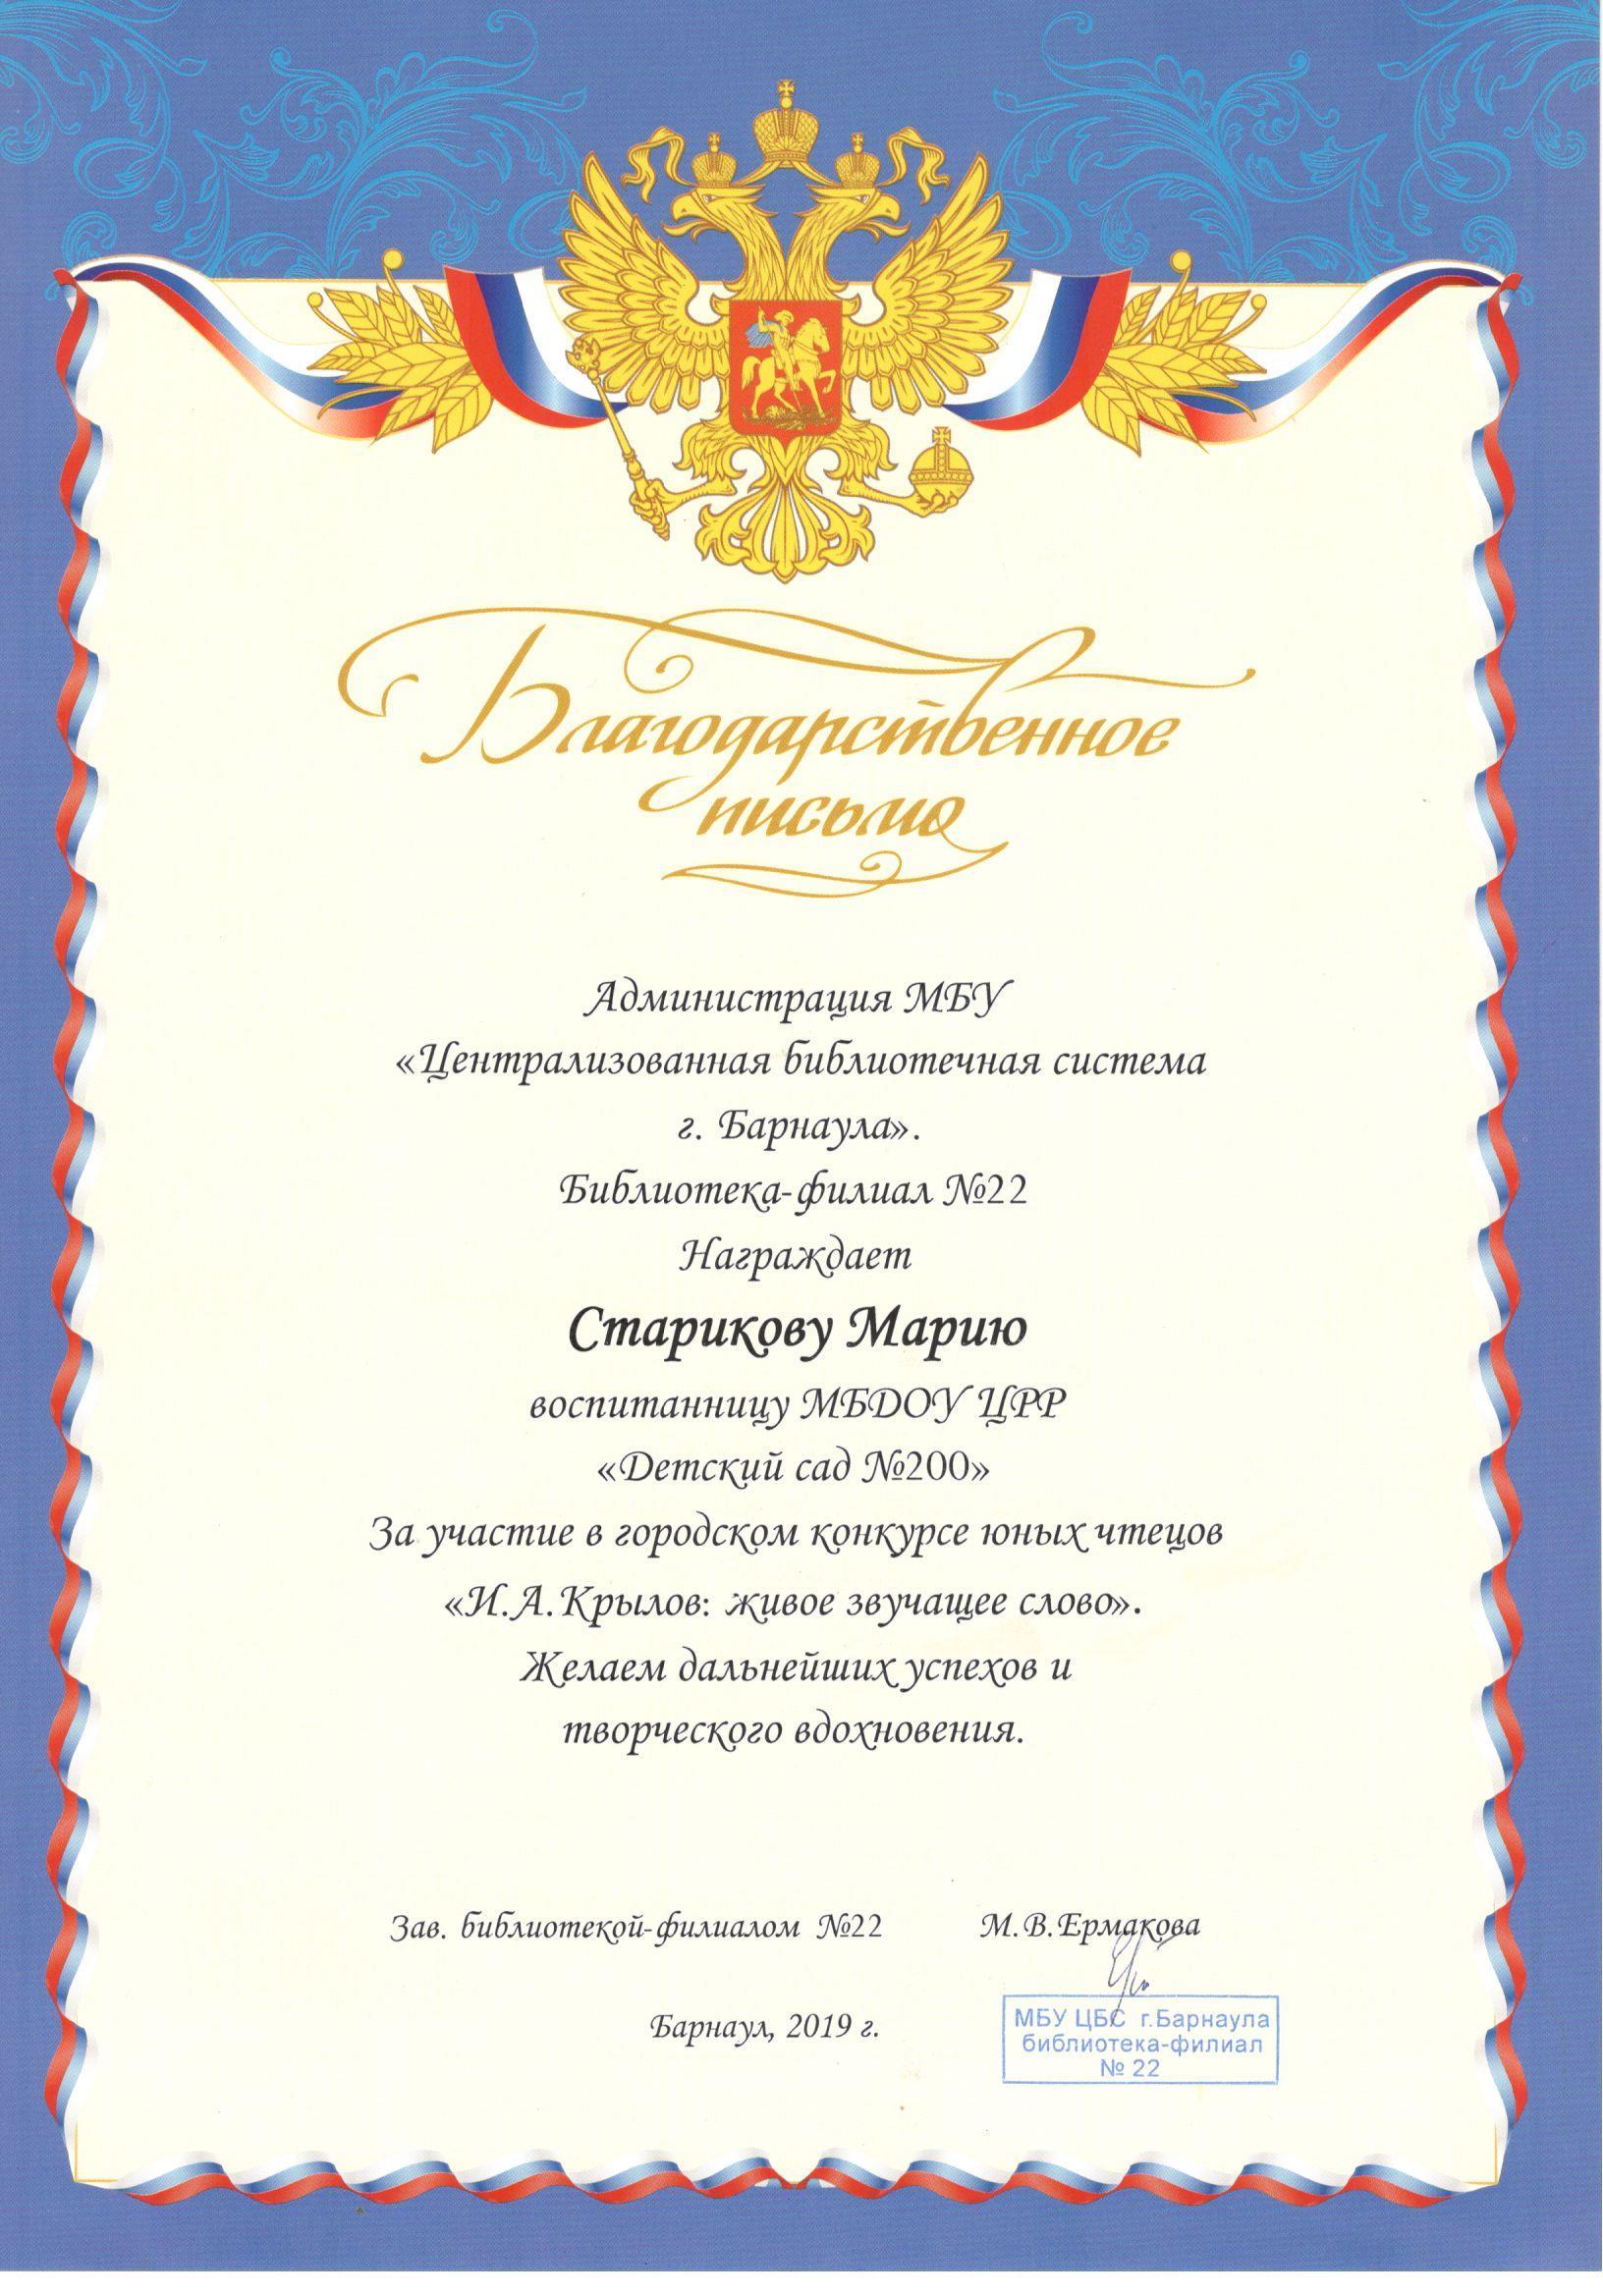 1_-конкурс-Мария-Старикова